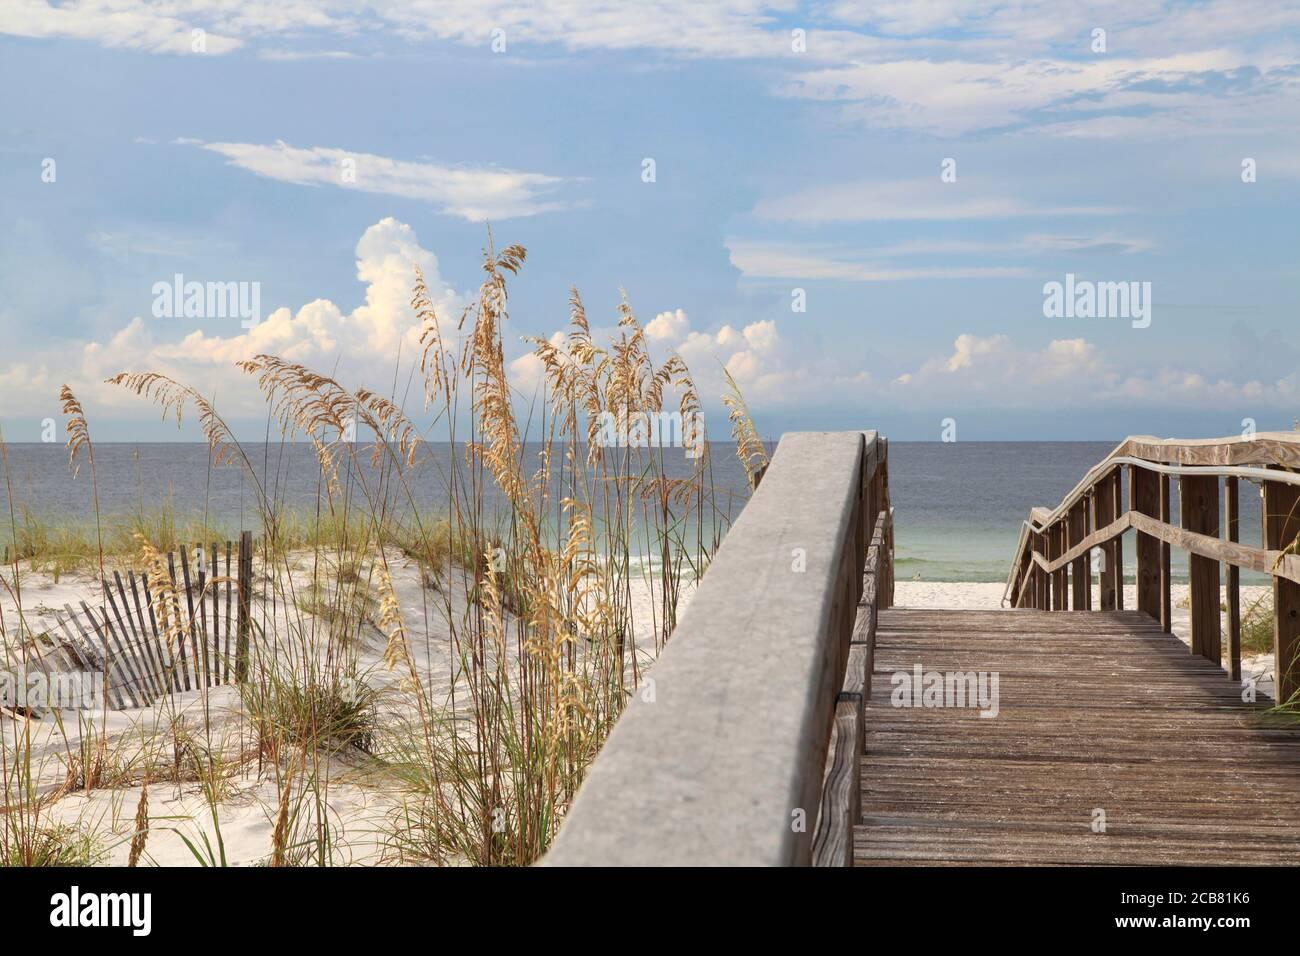 6 casino beach boardwalk gulf breeze fl